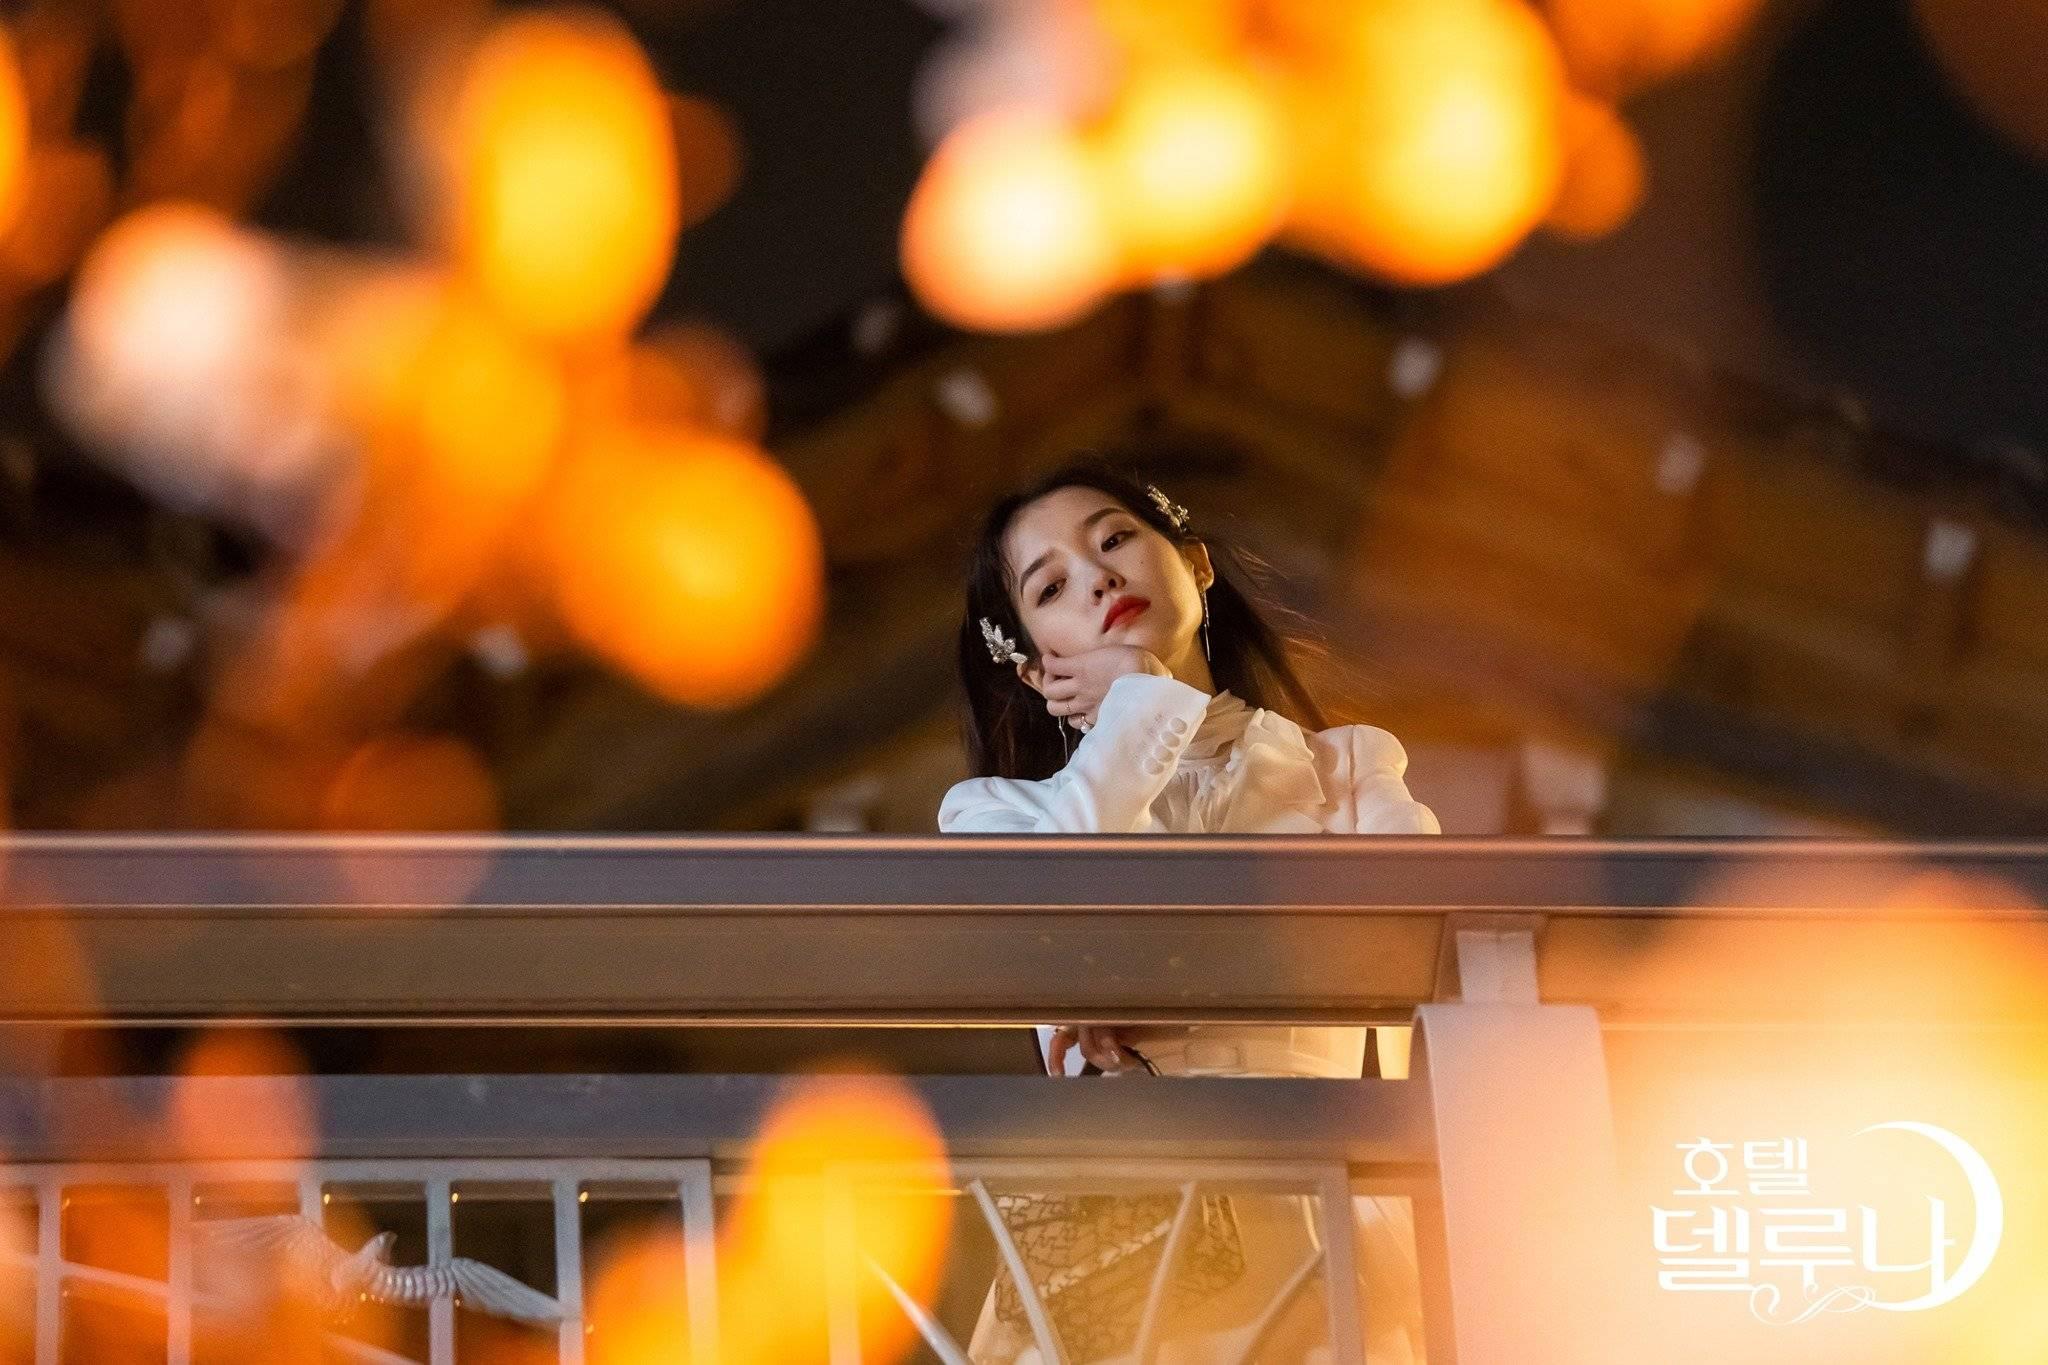 Hotel Del Luna (Korean Drama - 2019) - 호텔 델루나